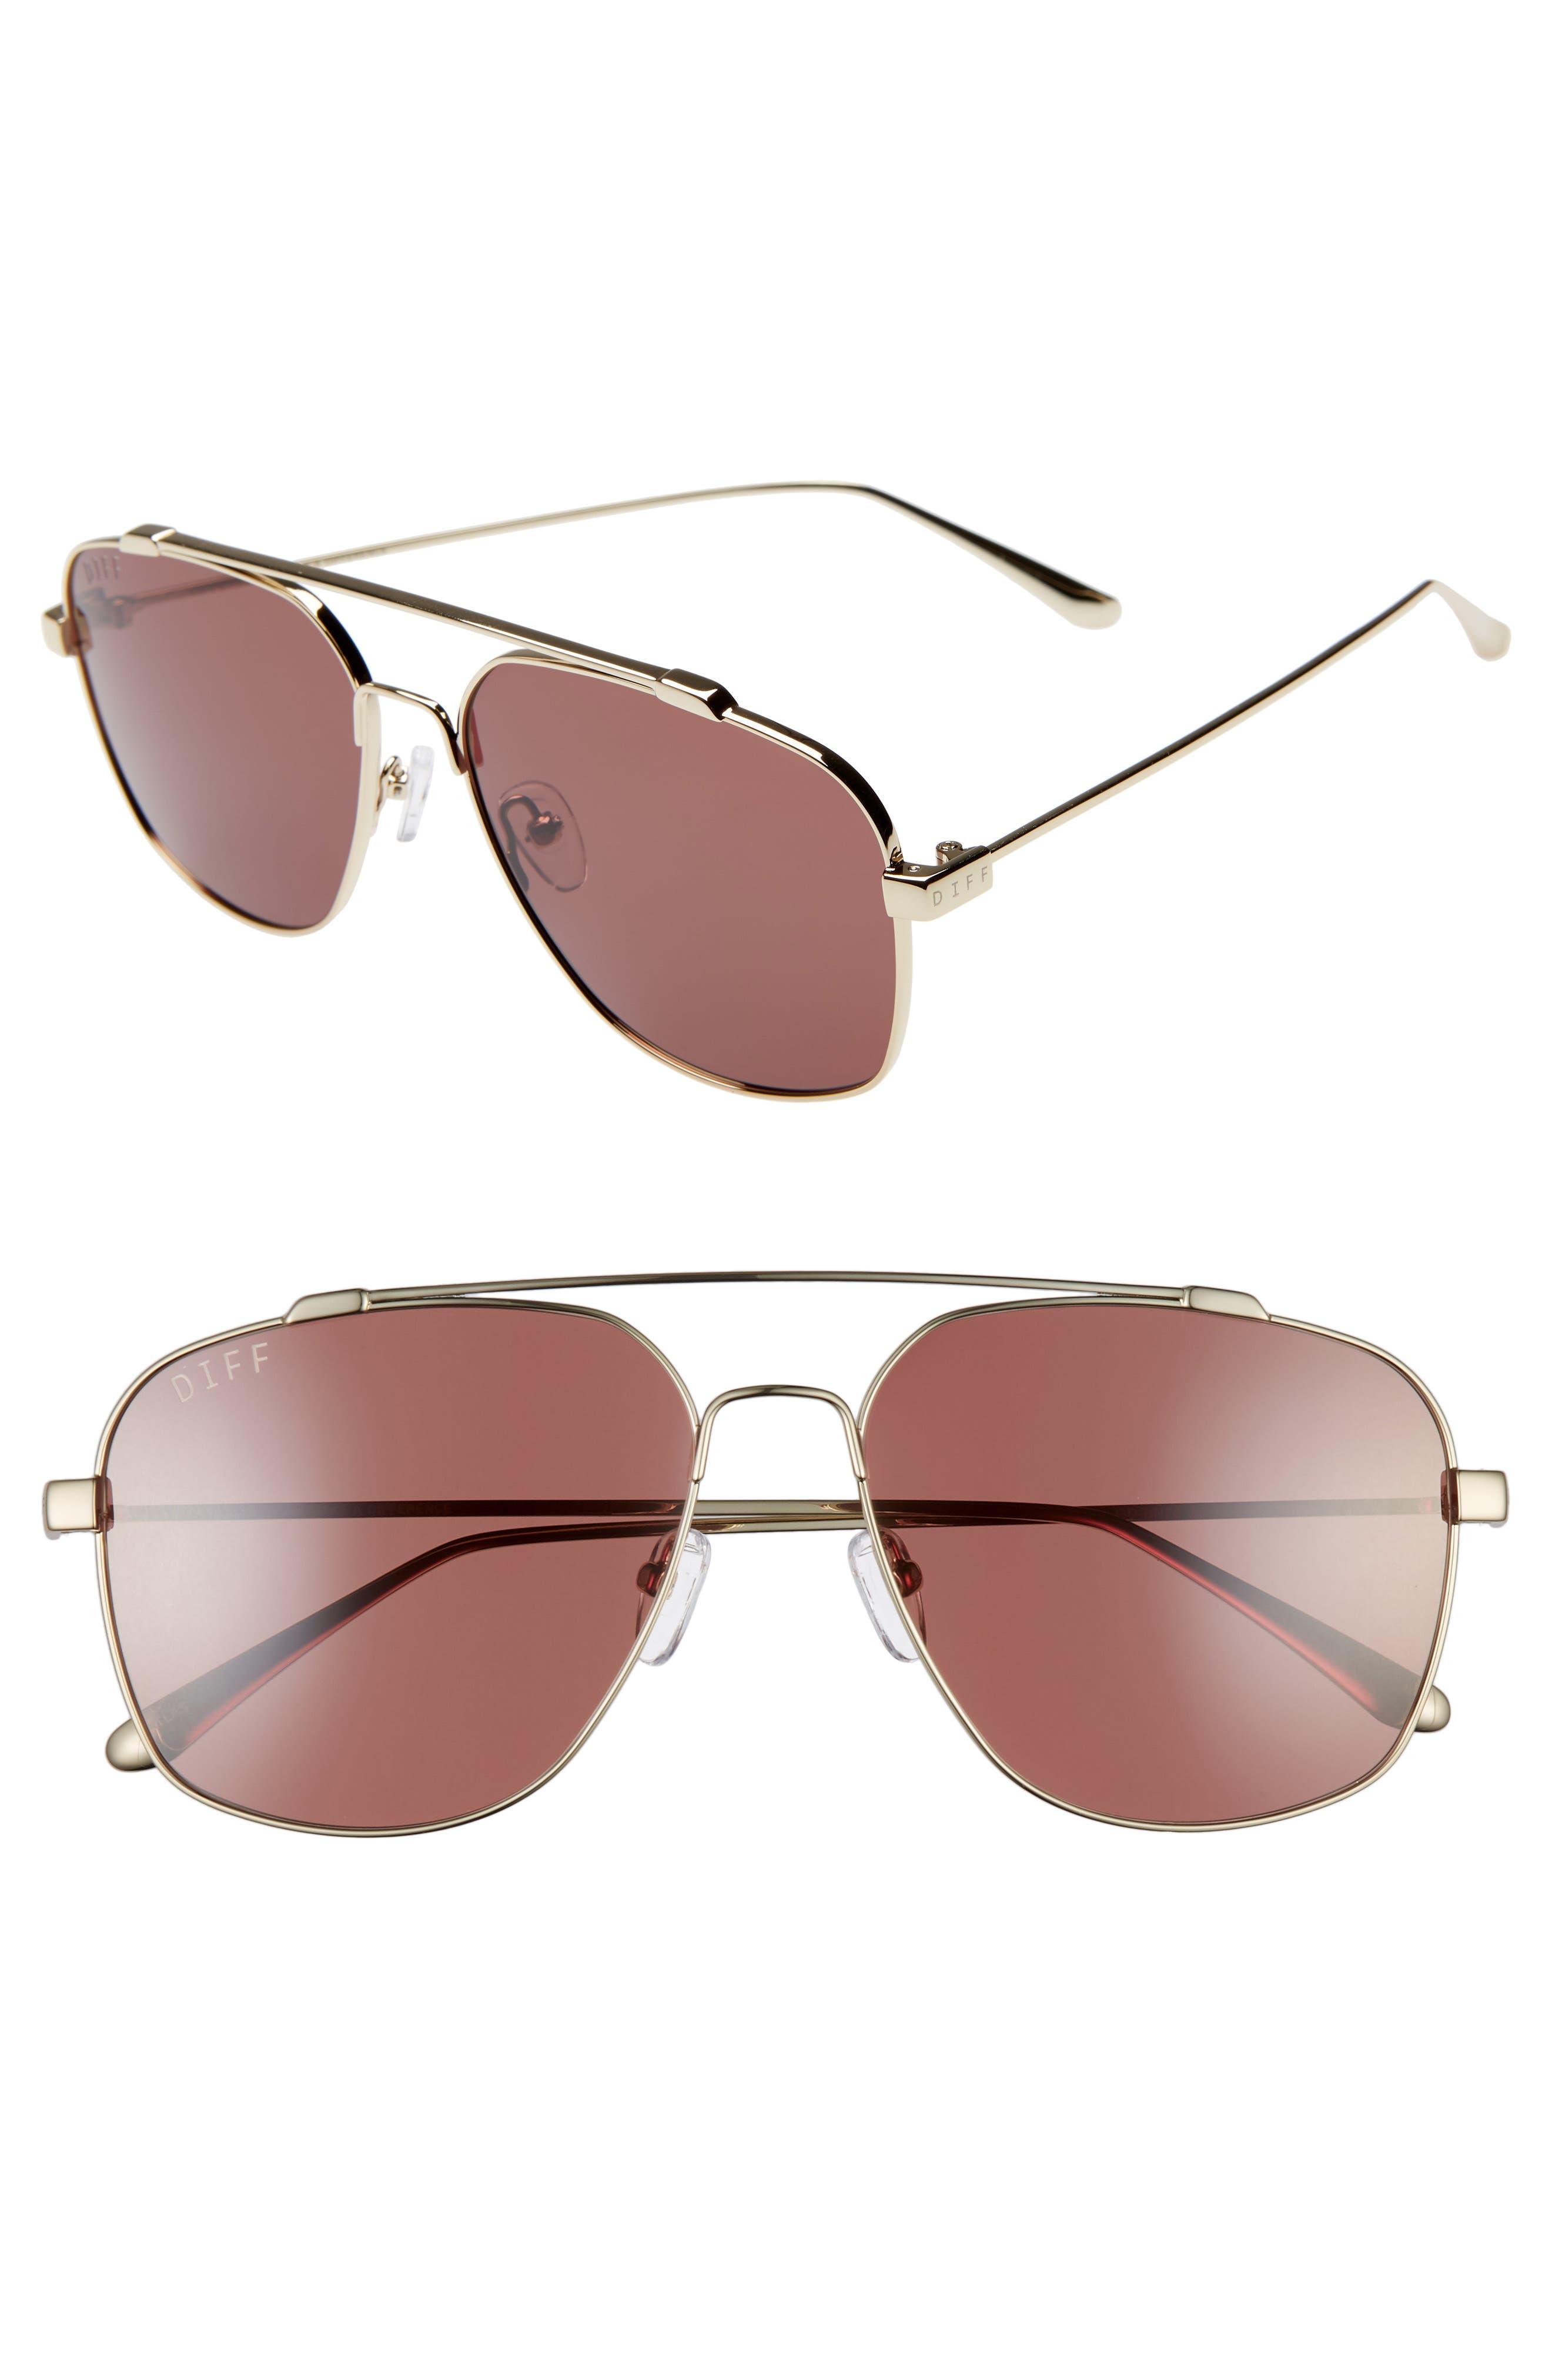 39d2a04d9bd Buy diff sunglasses & eyewear for women - Best women's diff sunglasses &  eyewear shop - Cools.com